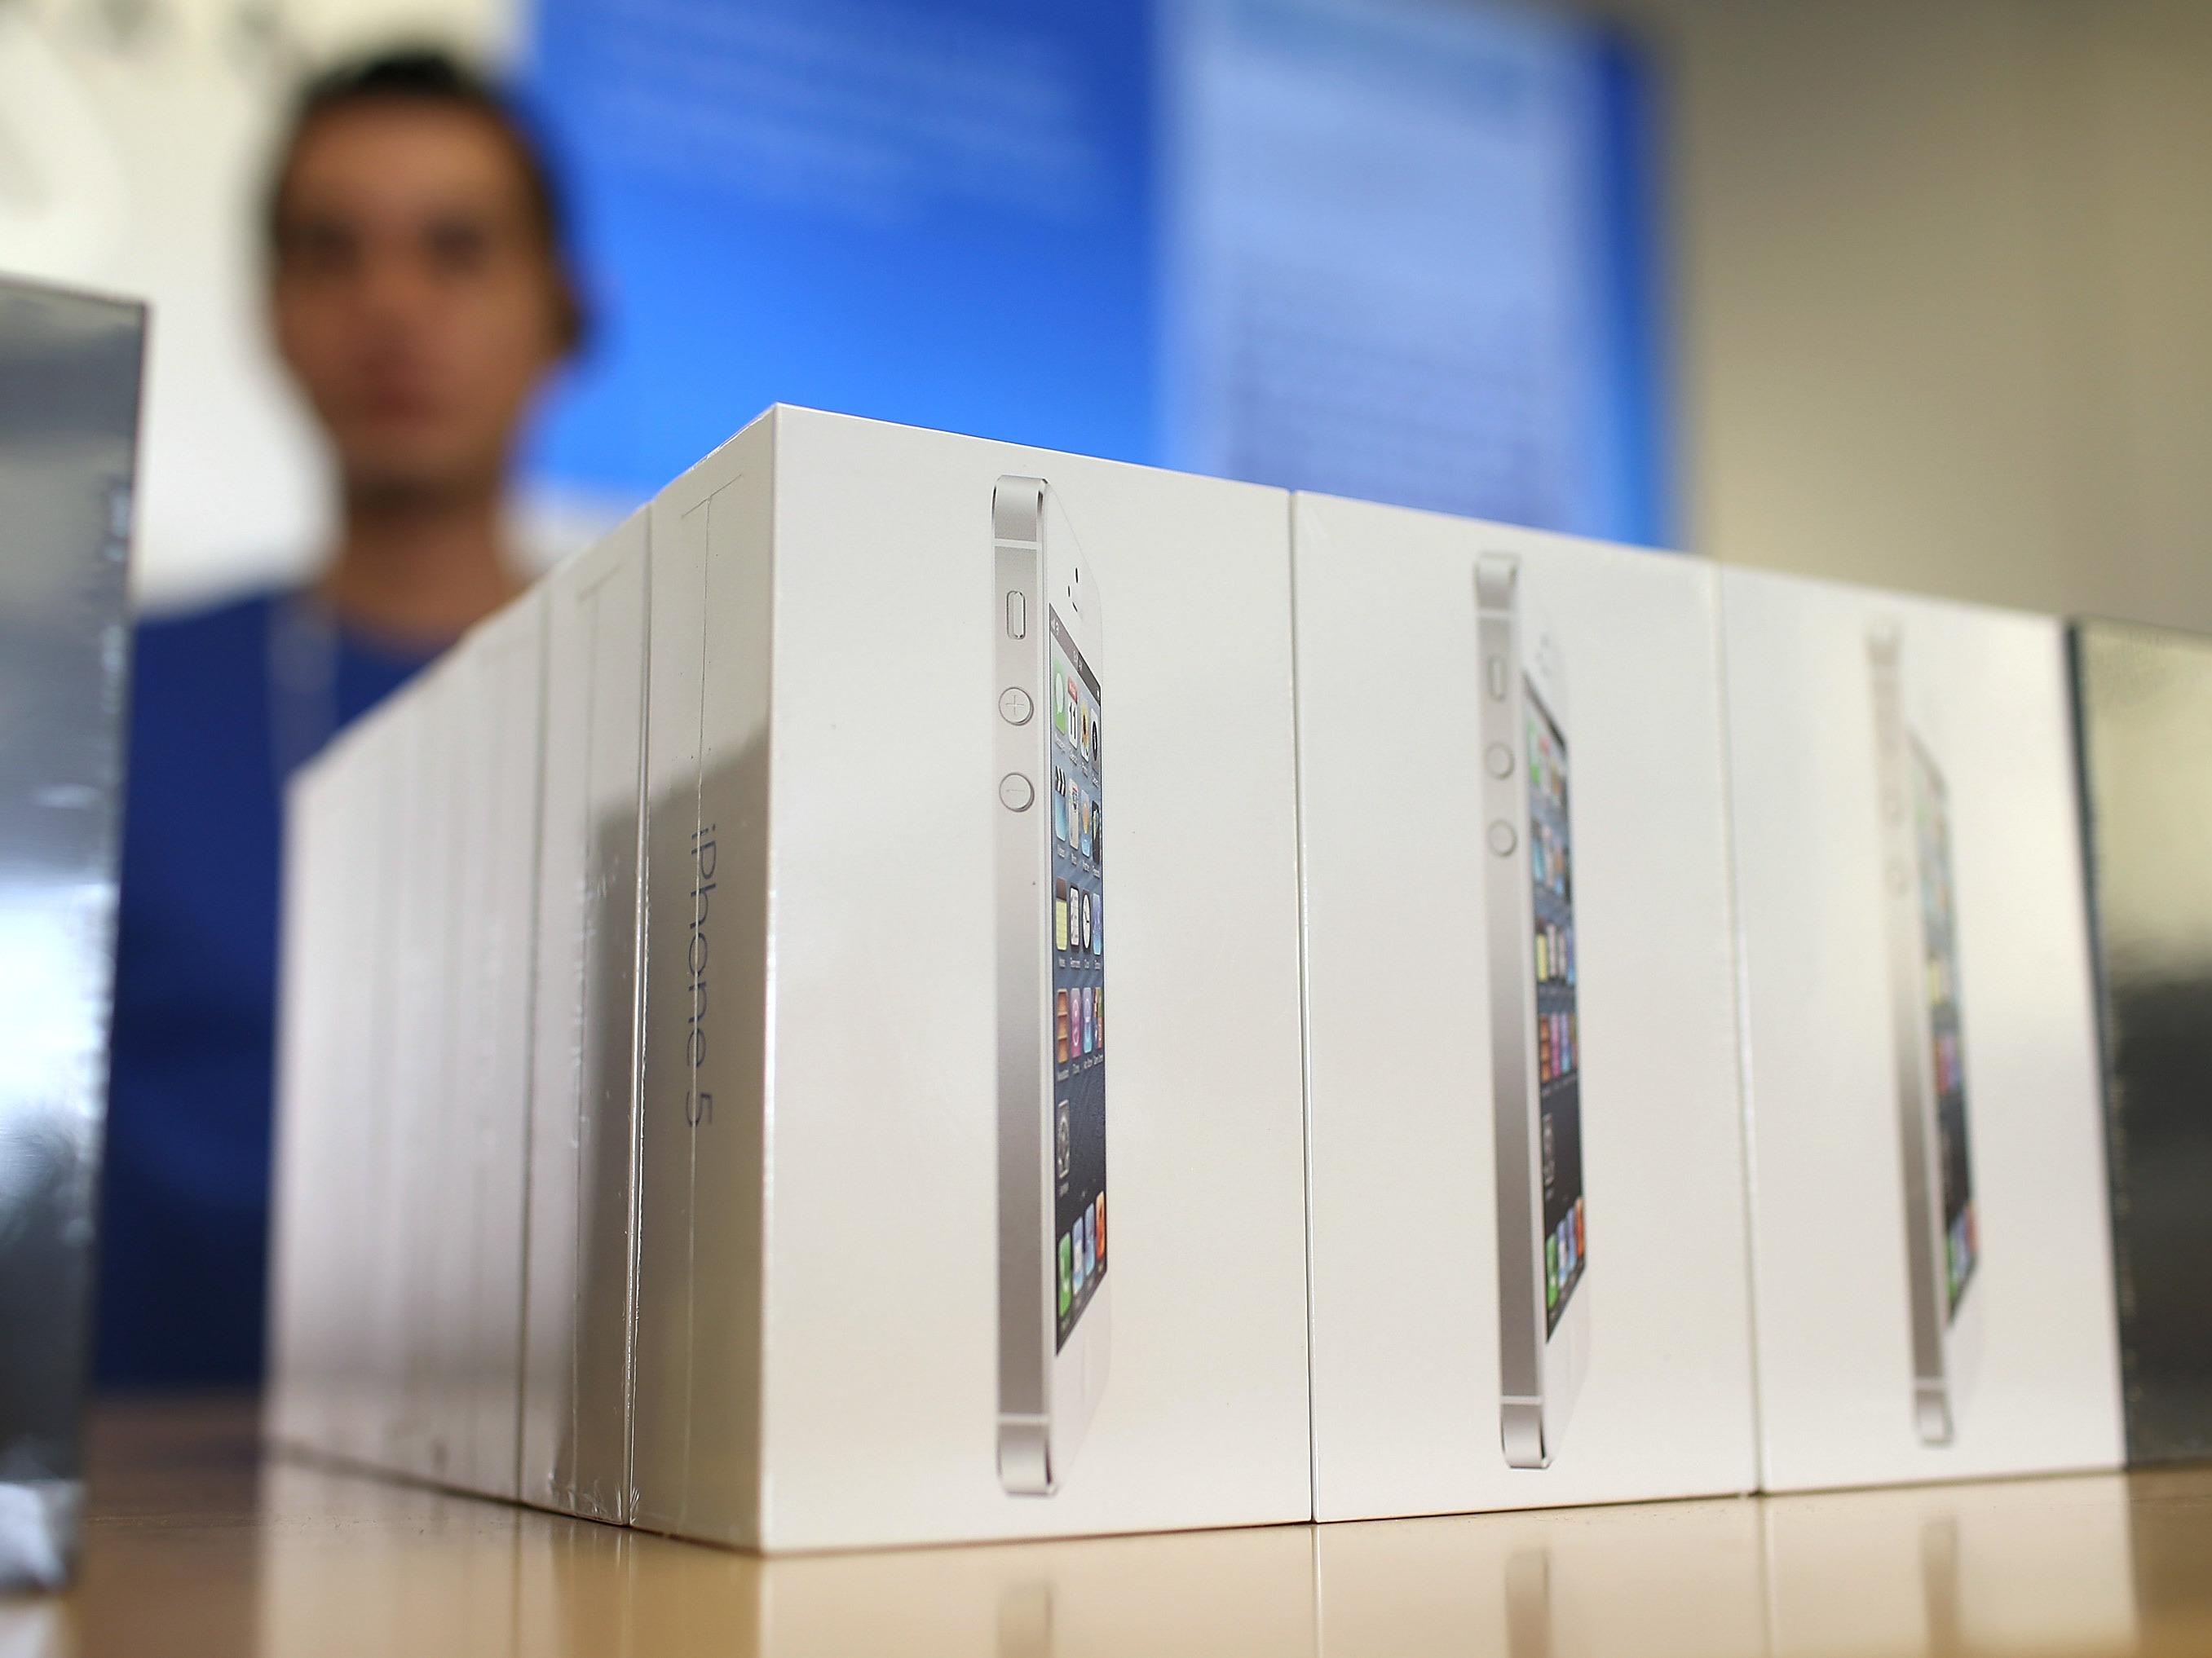 The Curious Craigslist Market For Empty Phone, Laptop Boxes